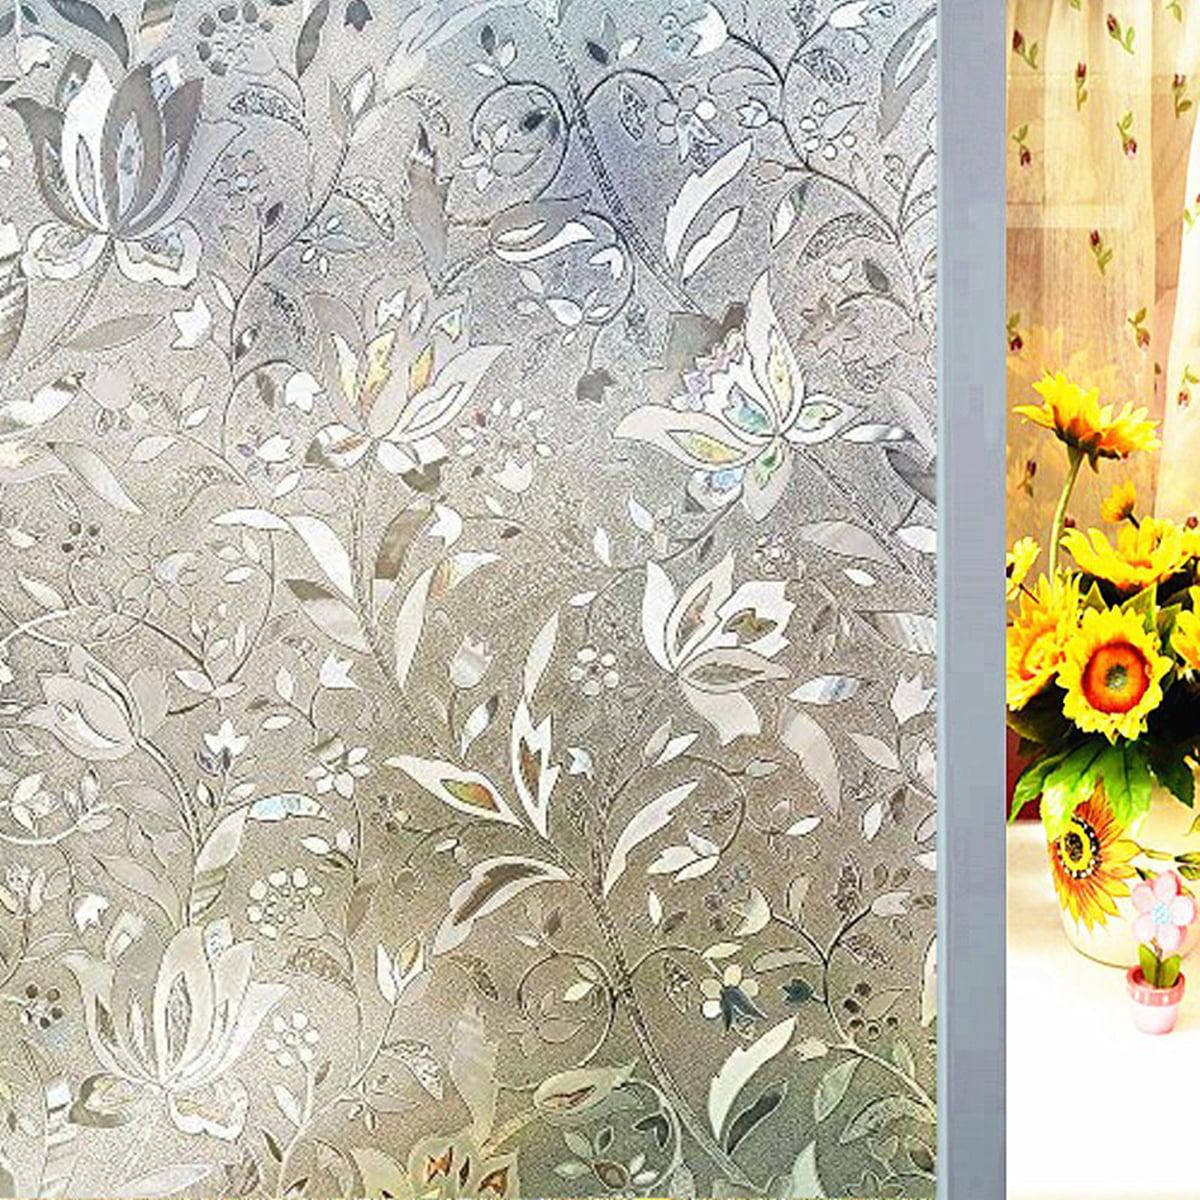 "17.5"" x 78.7"" 3D Window Films Privac y Film Door Glass Decorative Film Peel And Stick No Glue Self Adhesive Heat Control Anti Uv Sticker for Home Bedroom Bathroom"